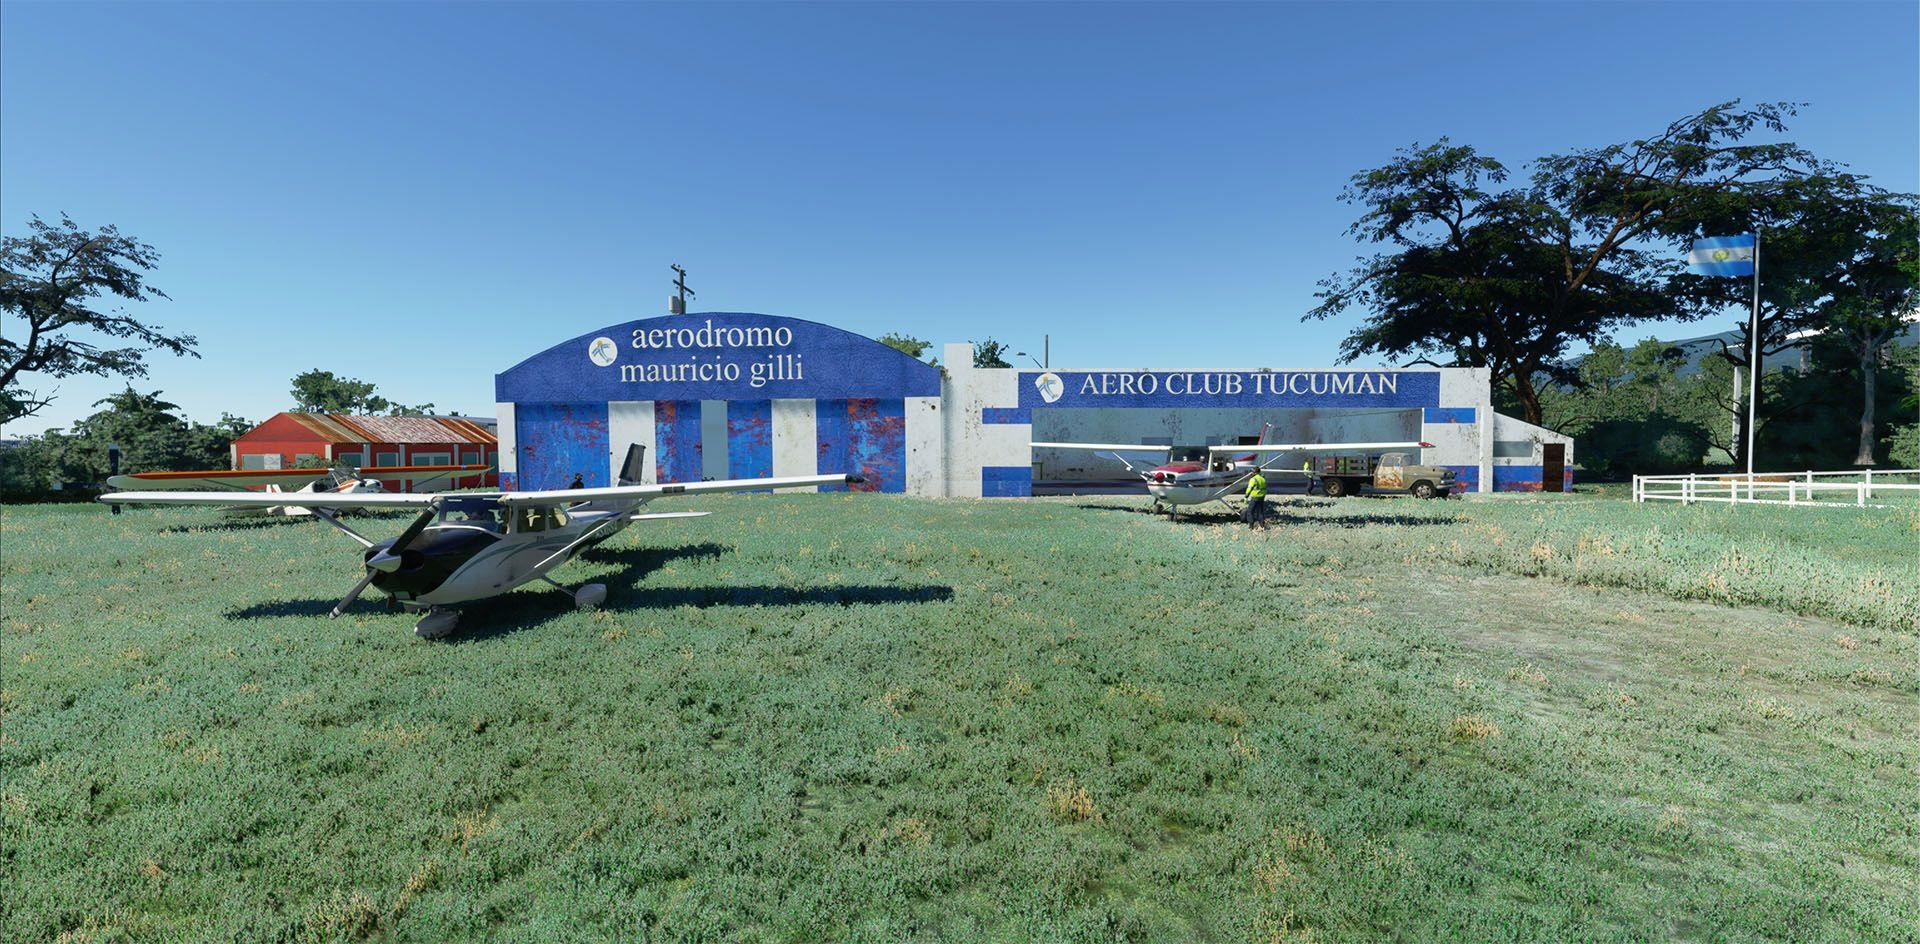 MSFS Horco Molle Aeroclub